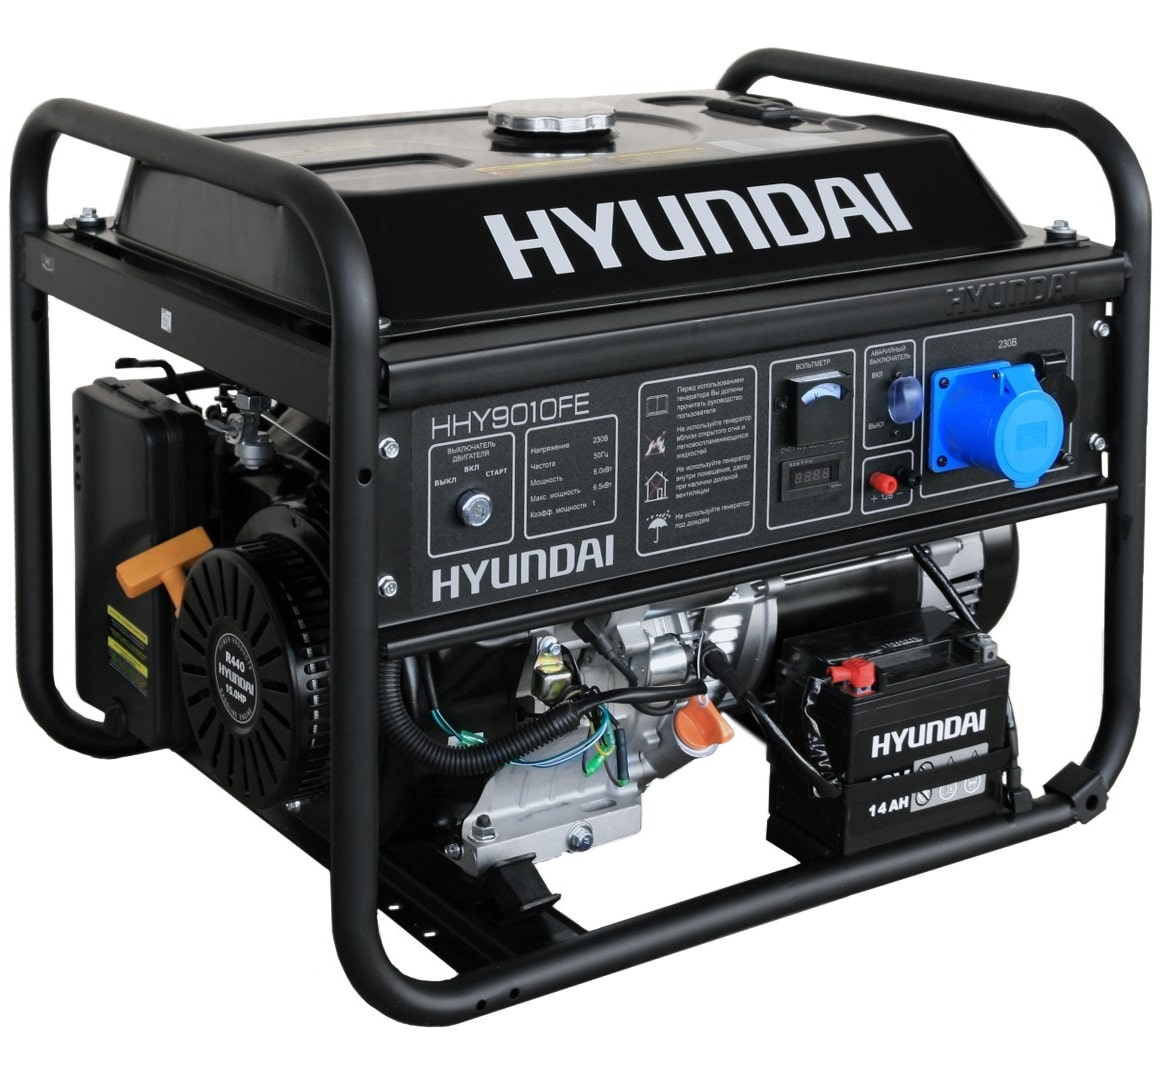 бензиновая электростанция hyundai hhy 9010fe